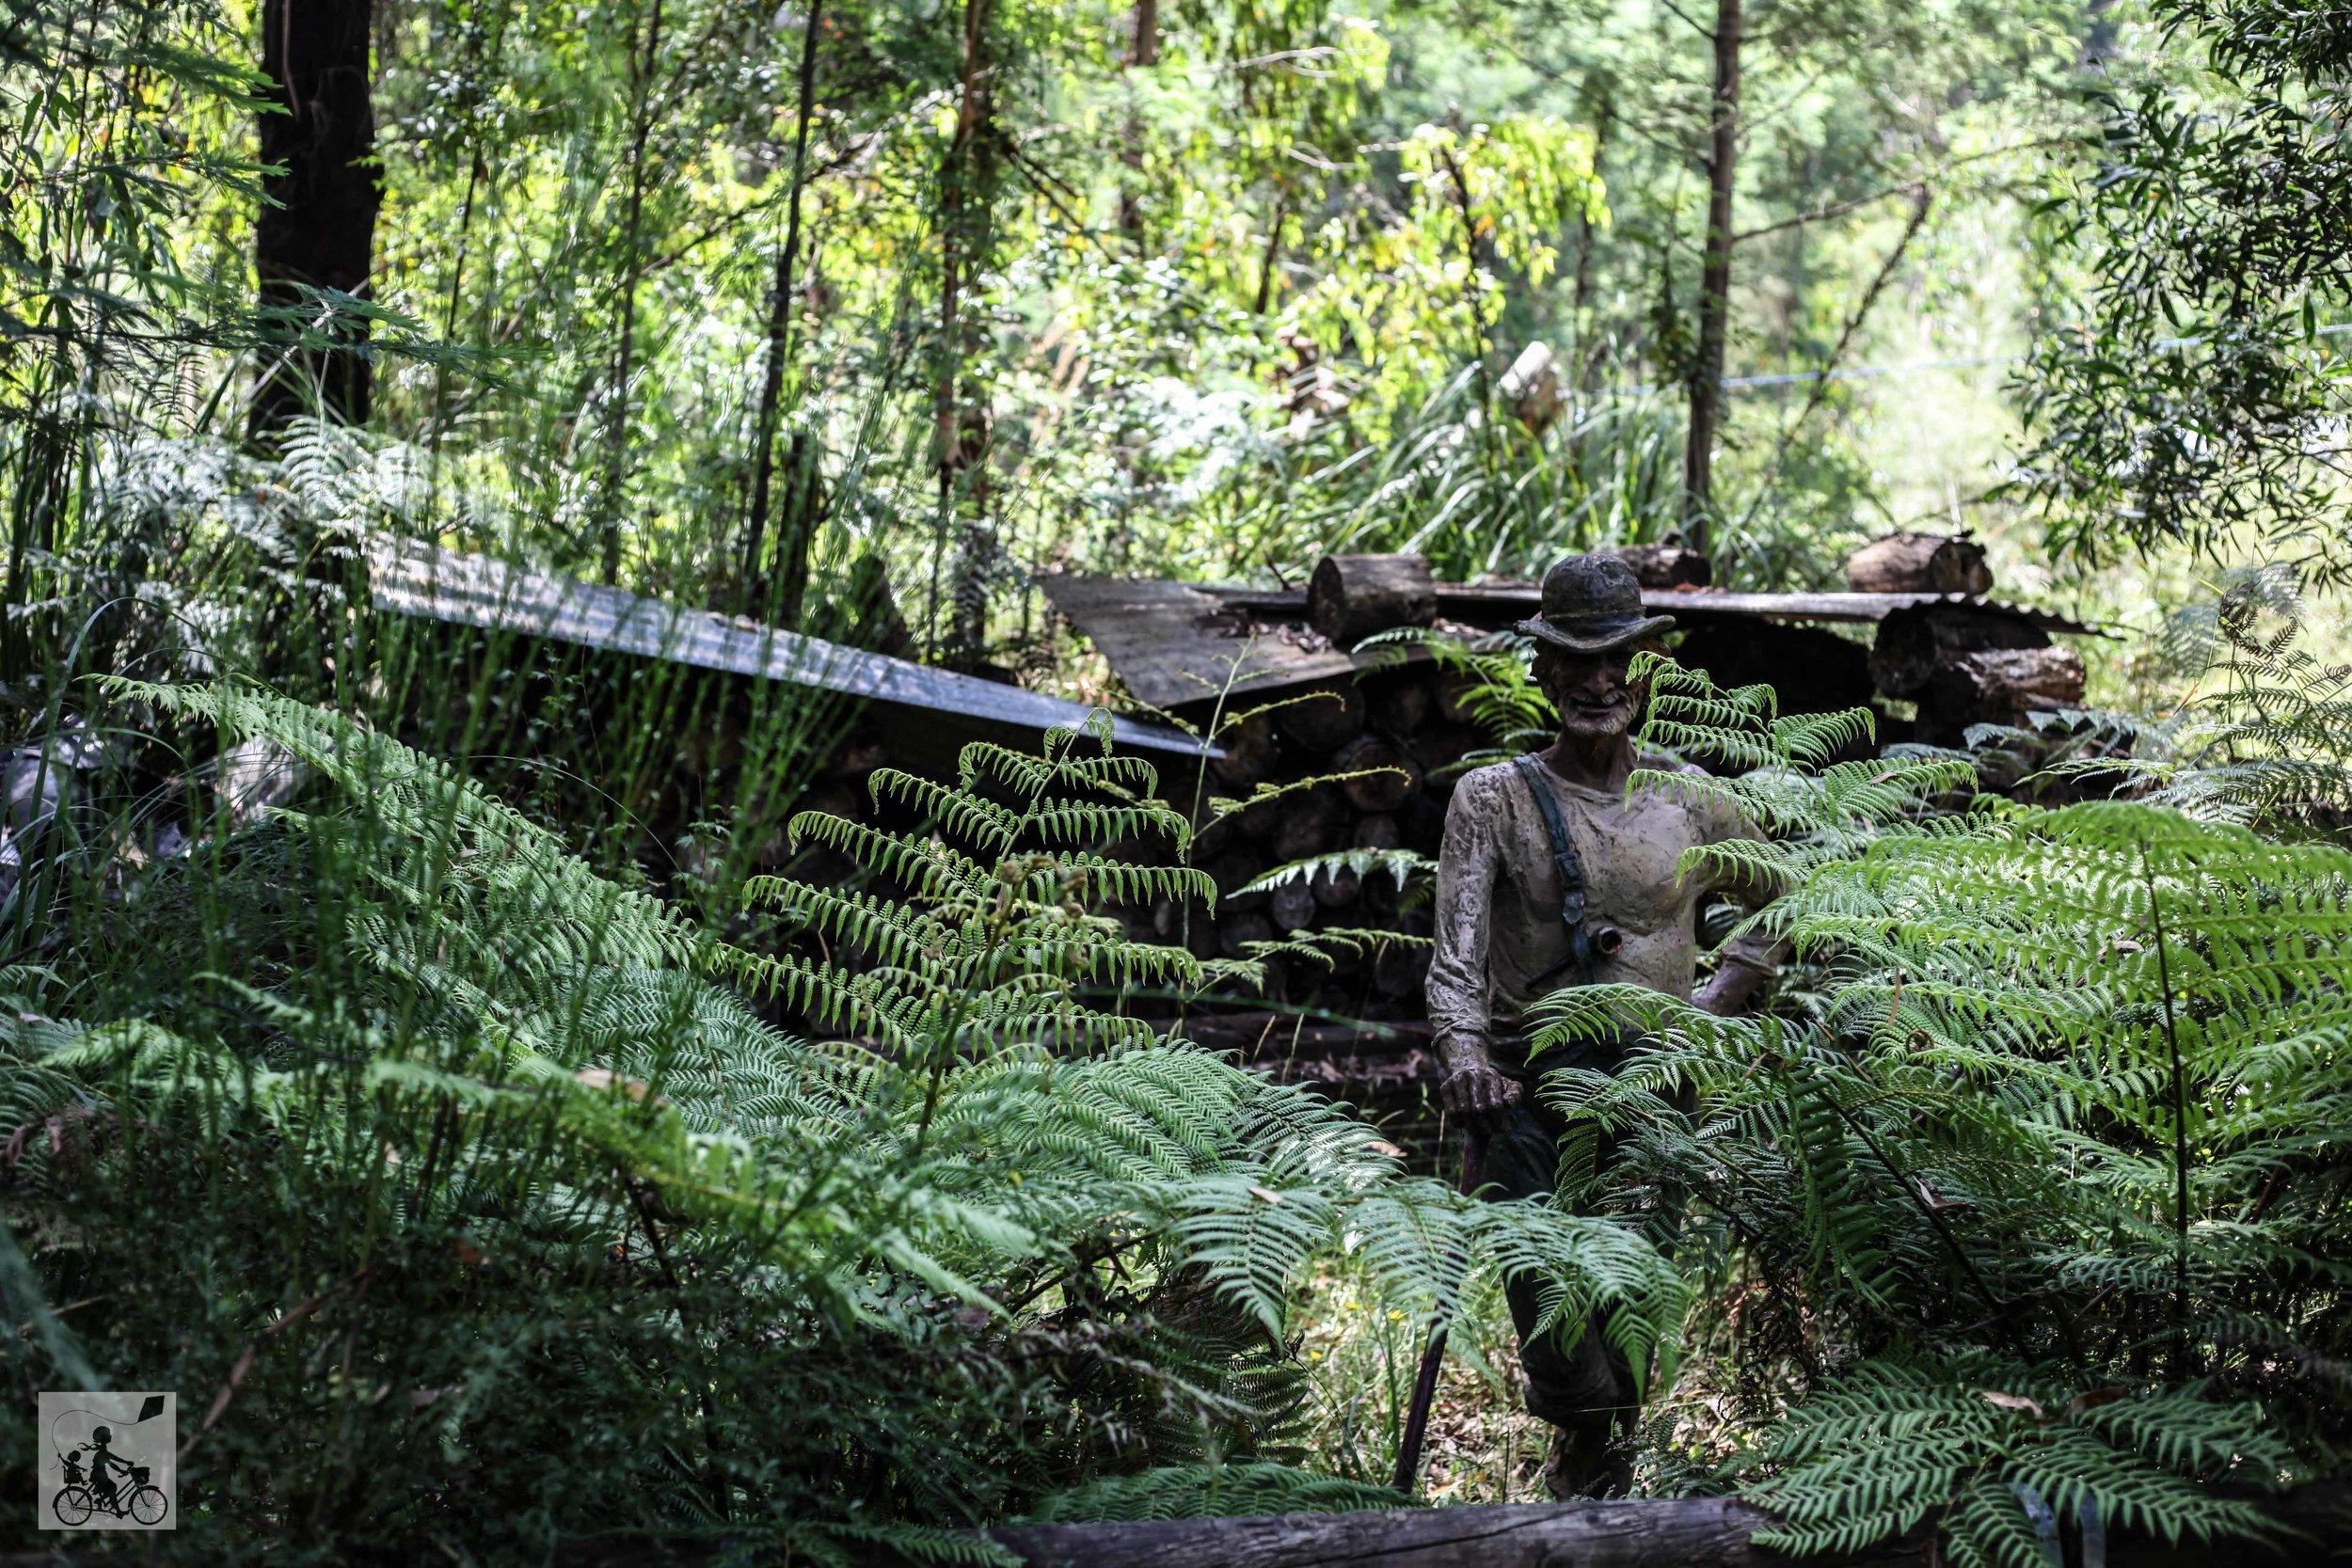 Mamma Knows East - Bruno's Art and Sculpture Garden